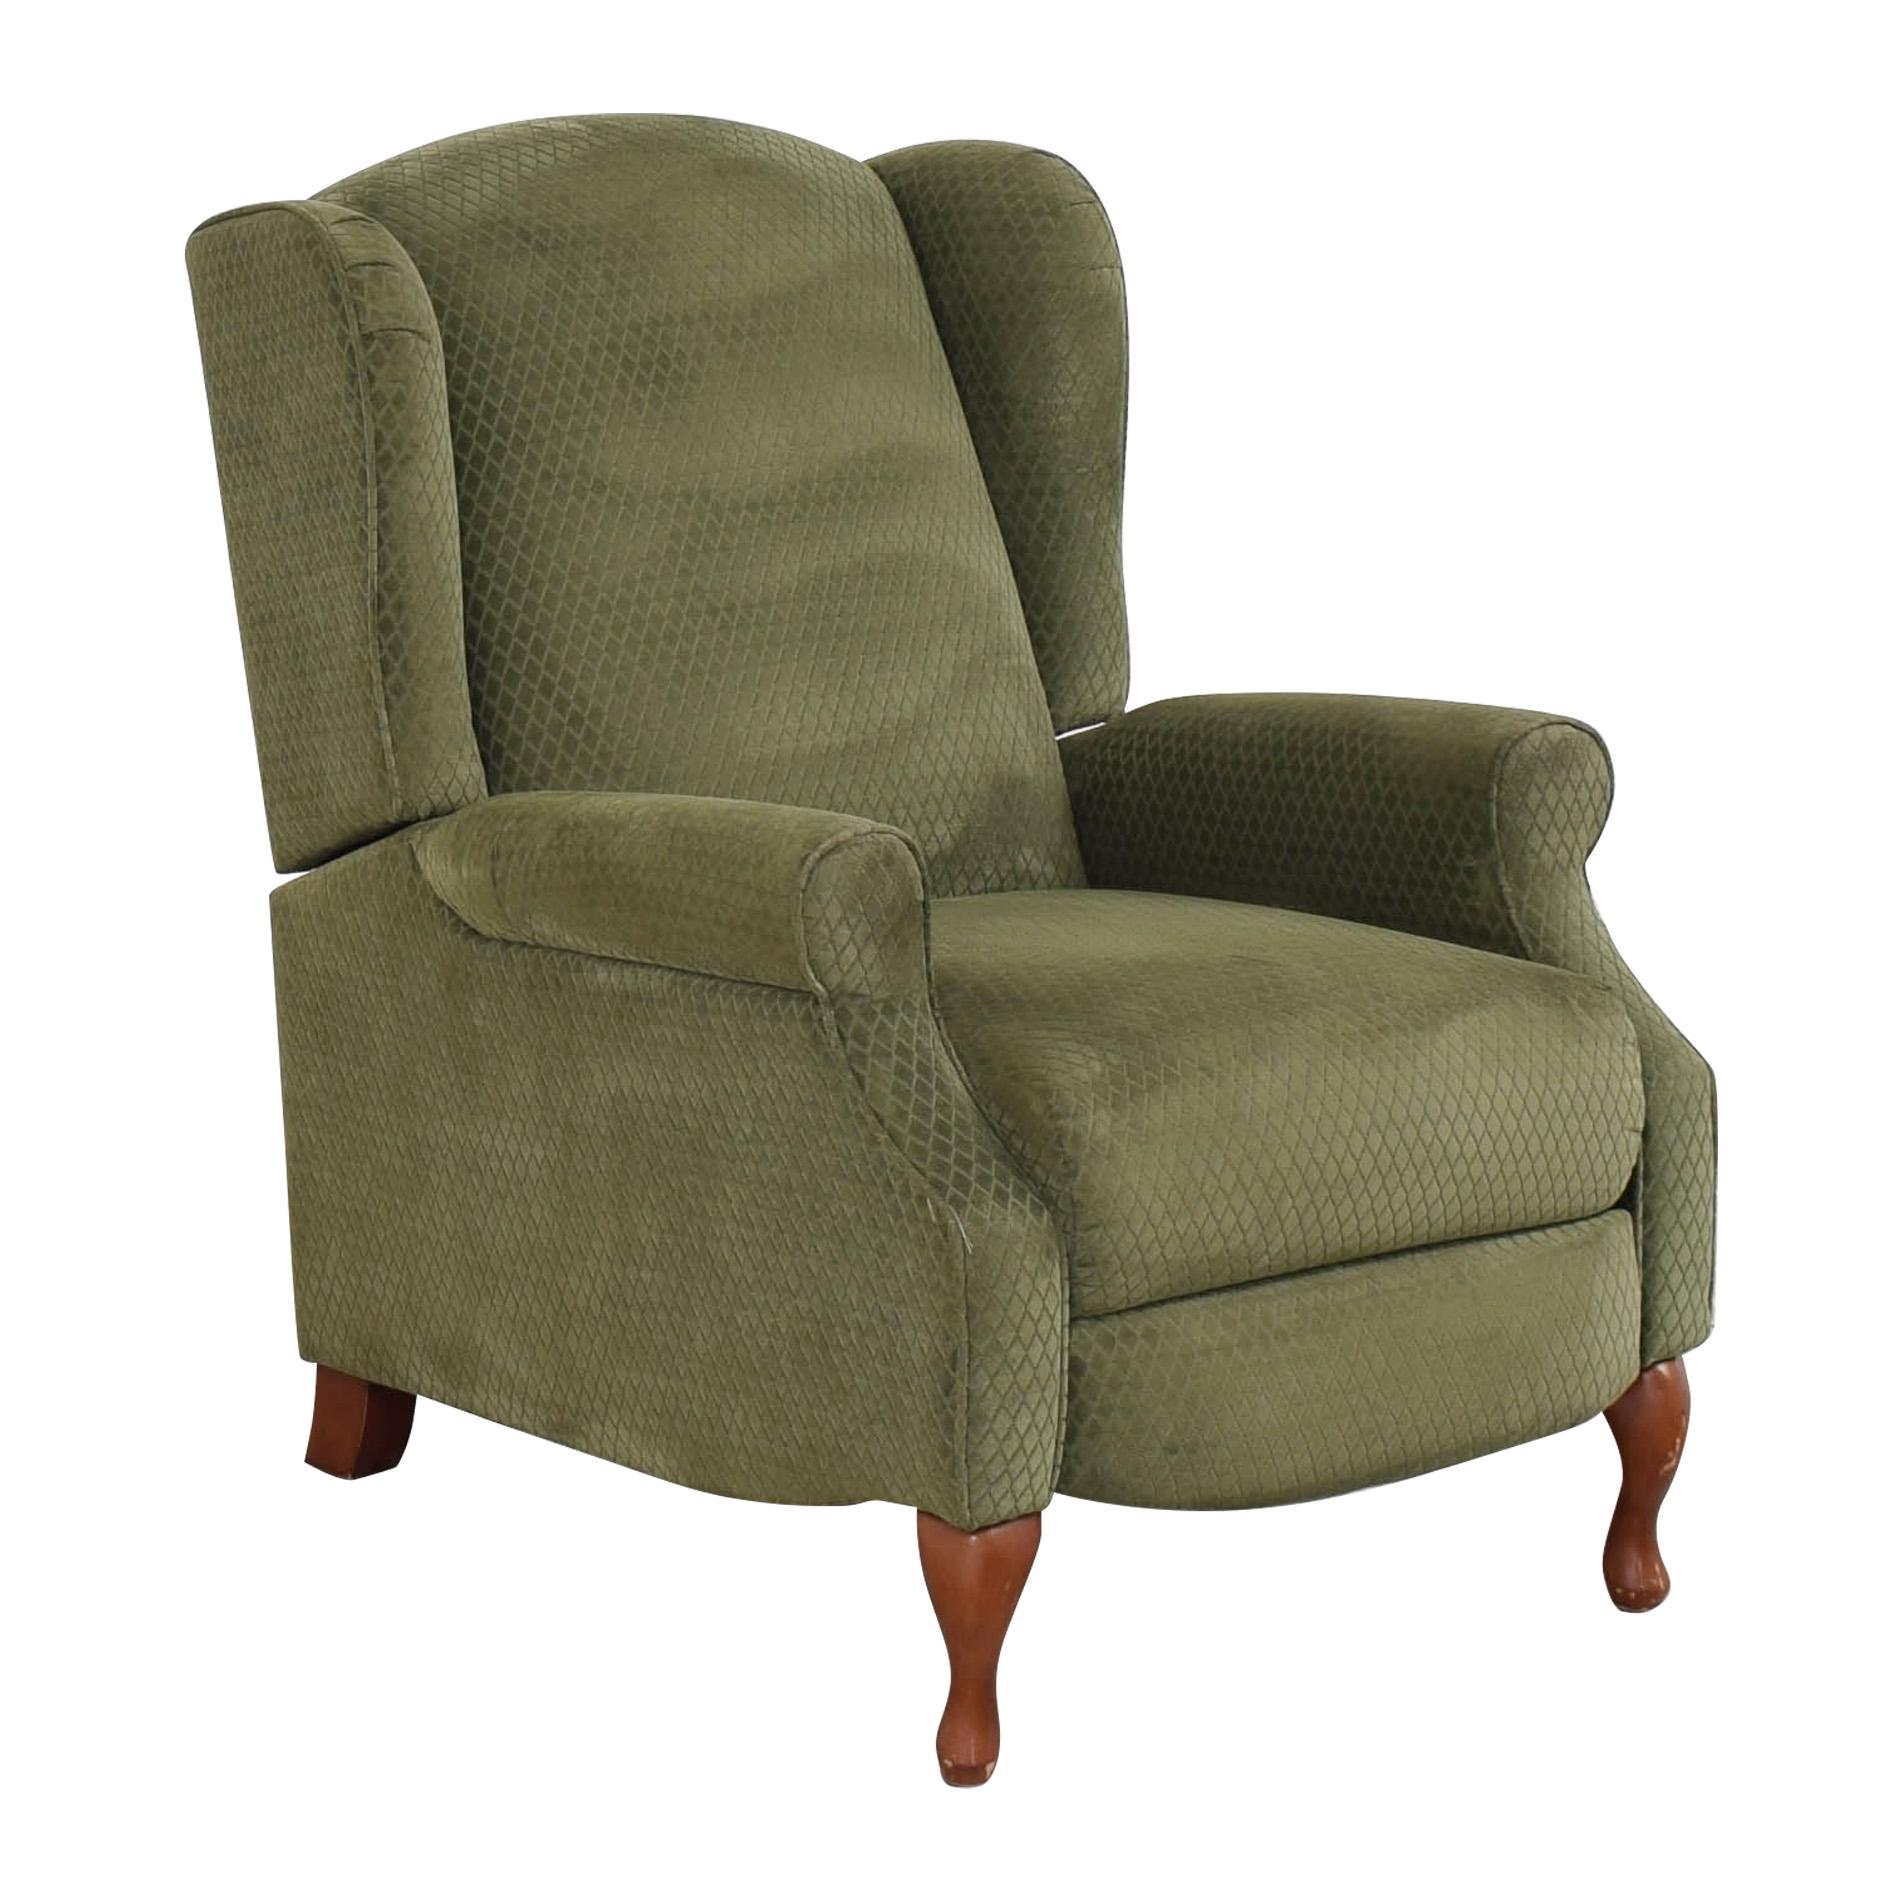 Macy's Macy's Edie Fabric Push Back Recliner Chairs